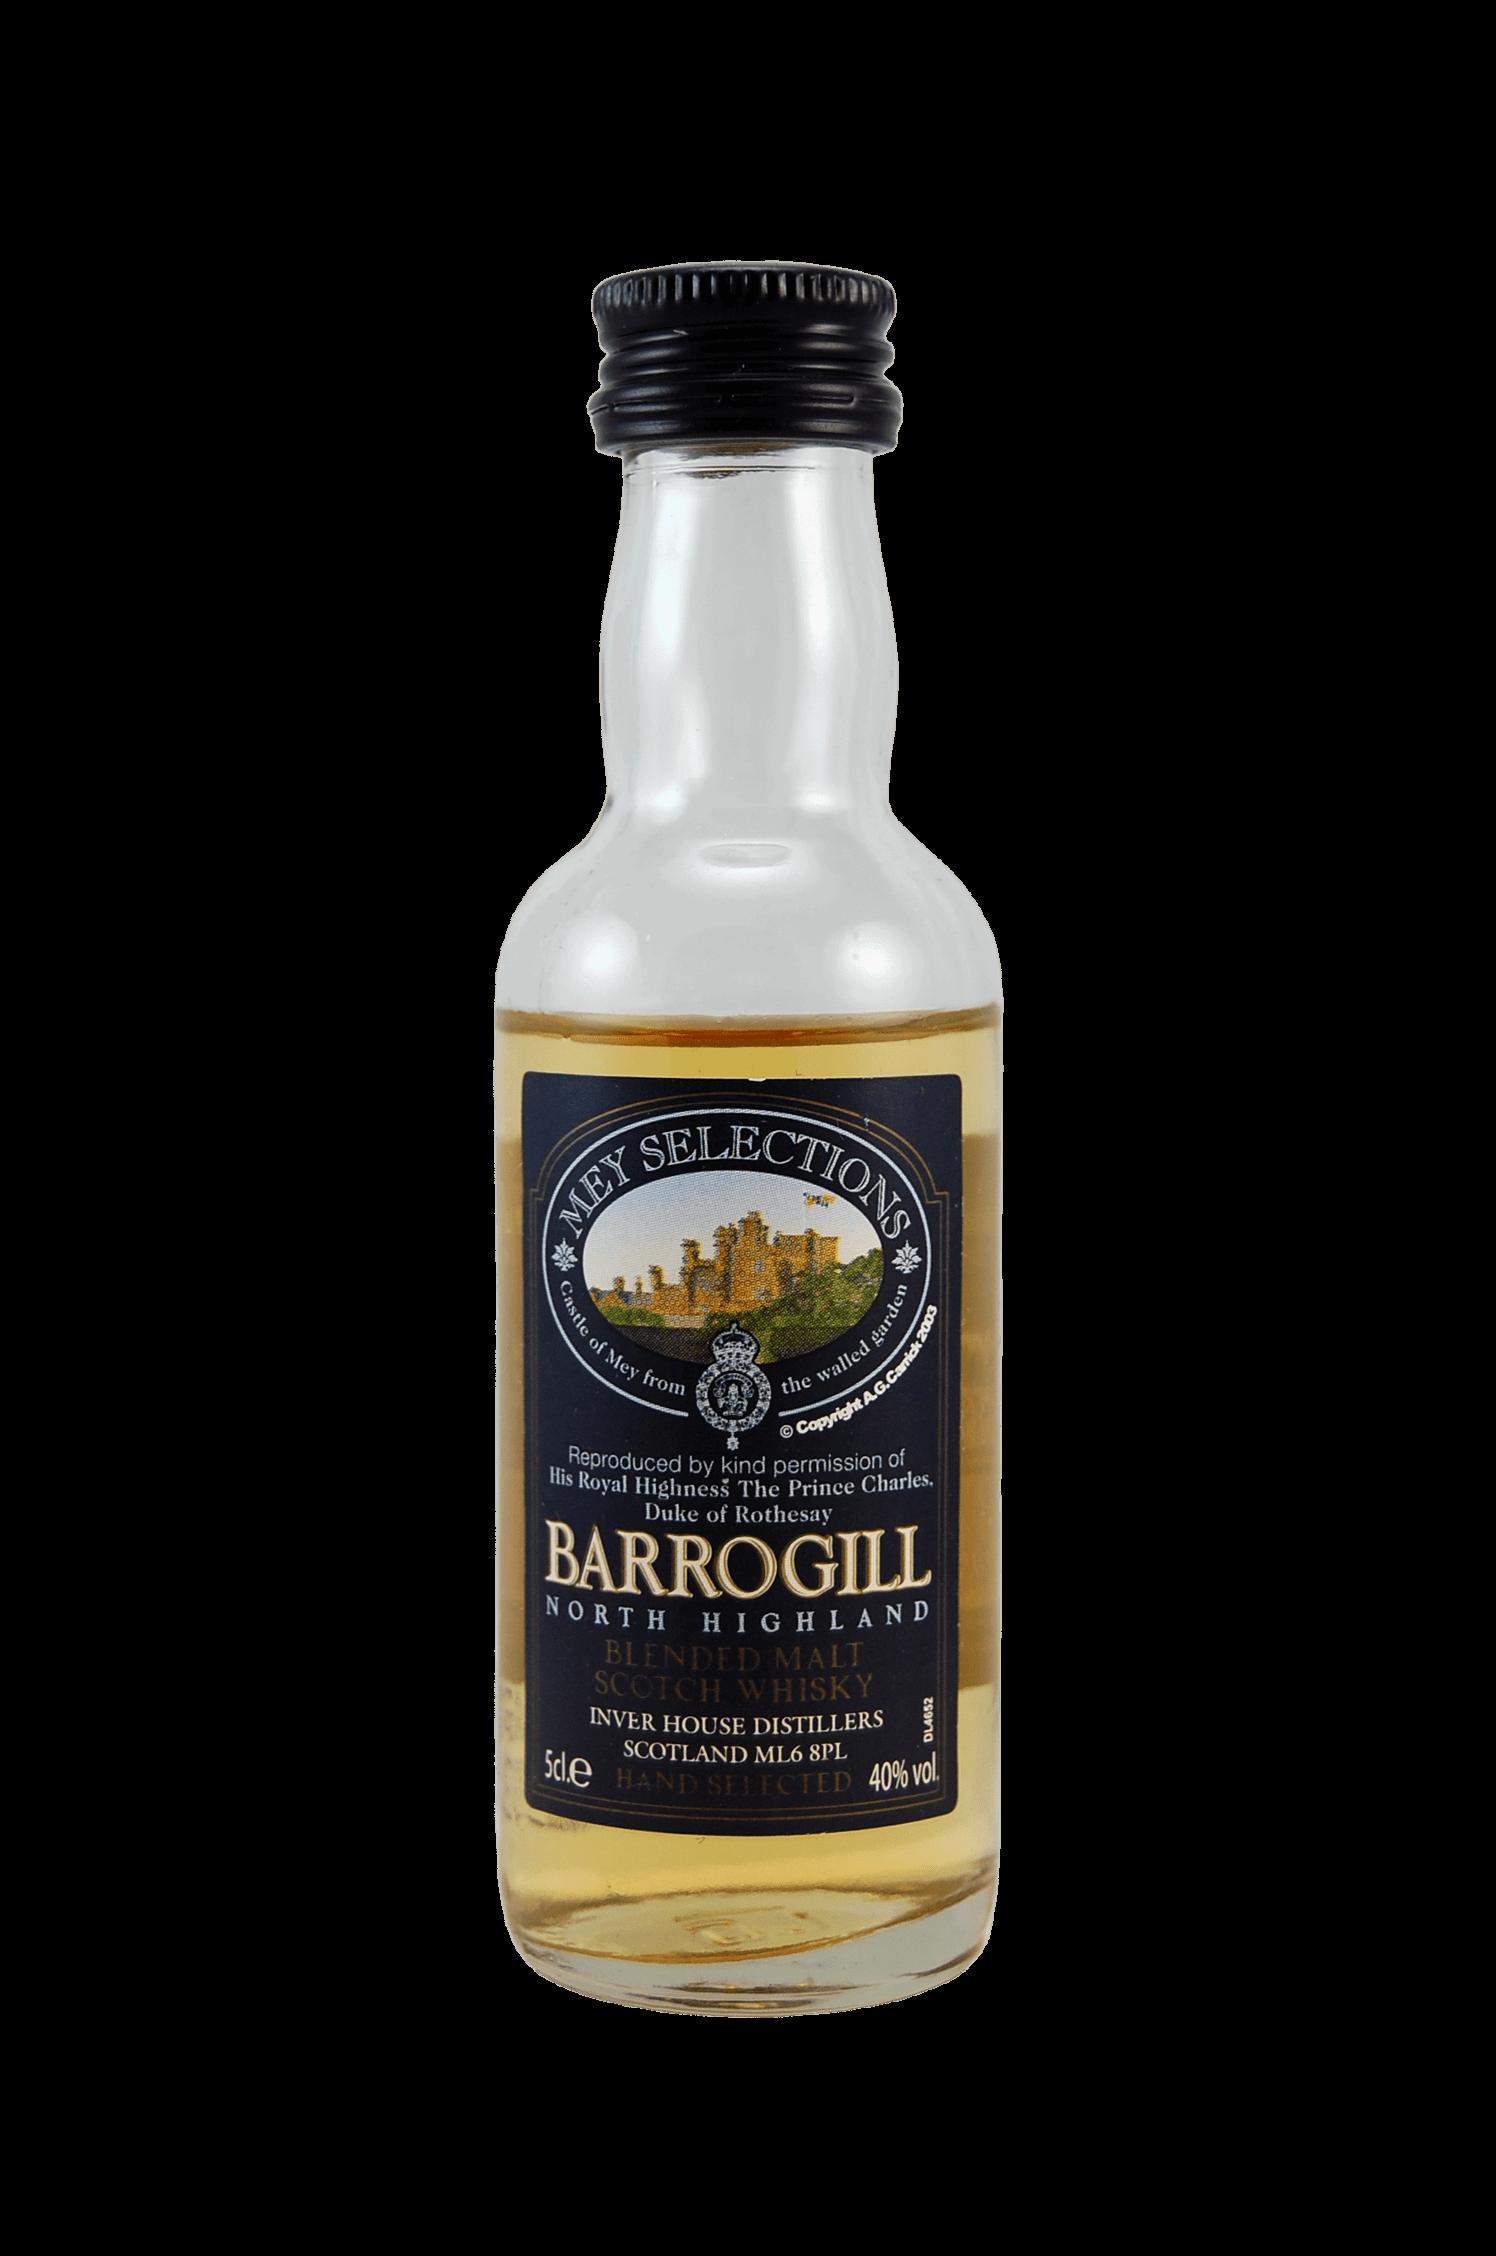 Barrogill Scotch Whisky